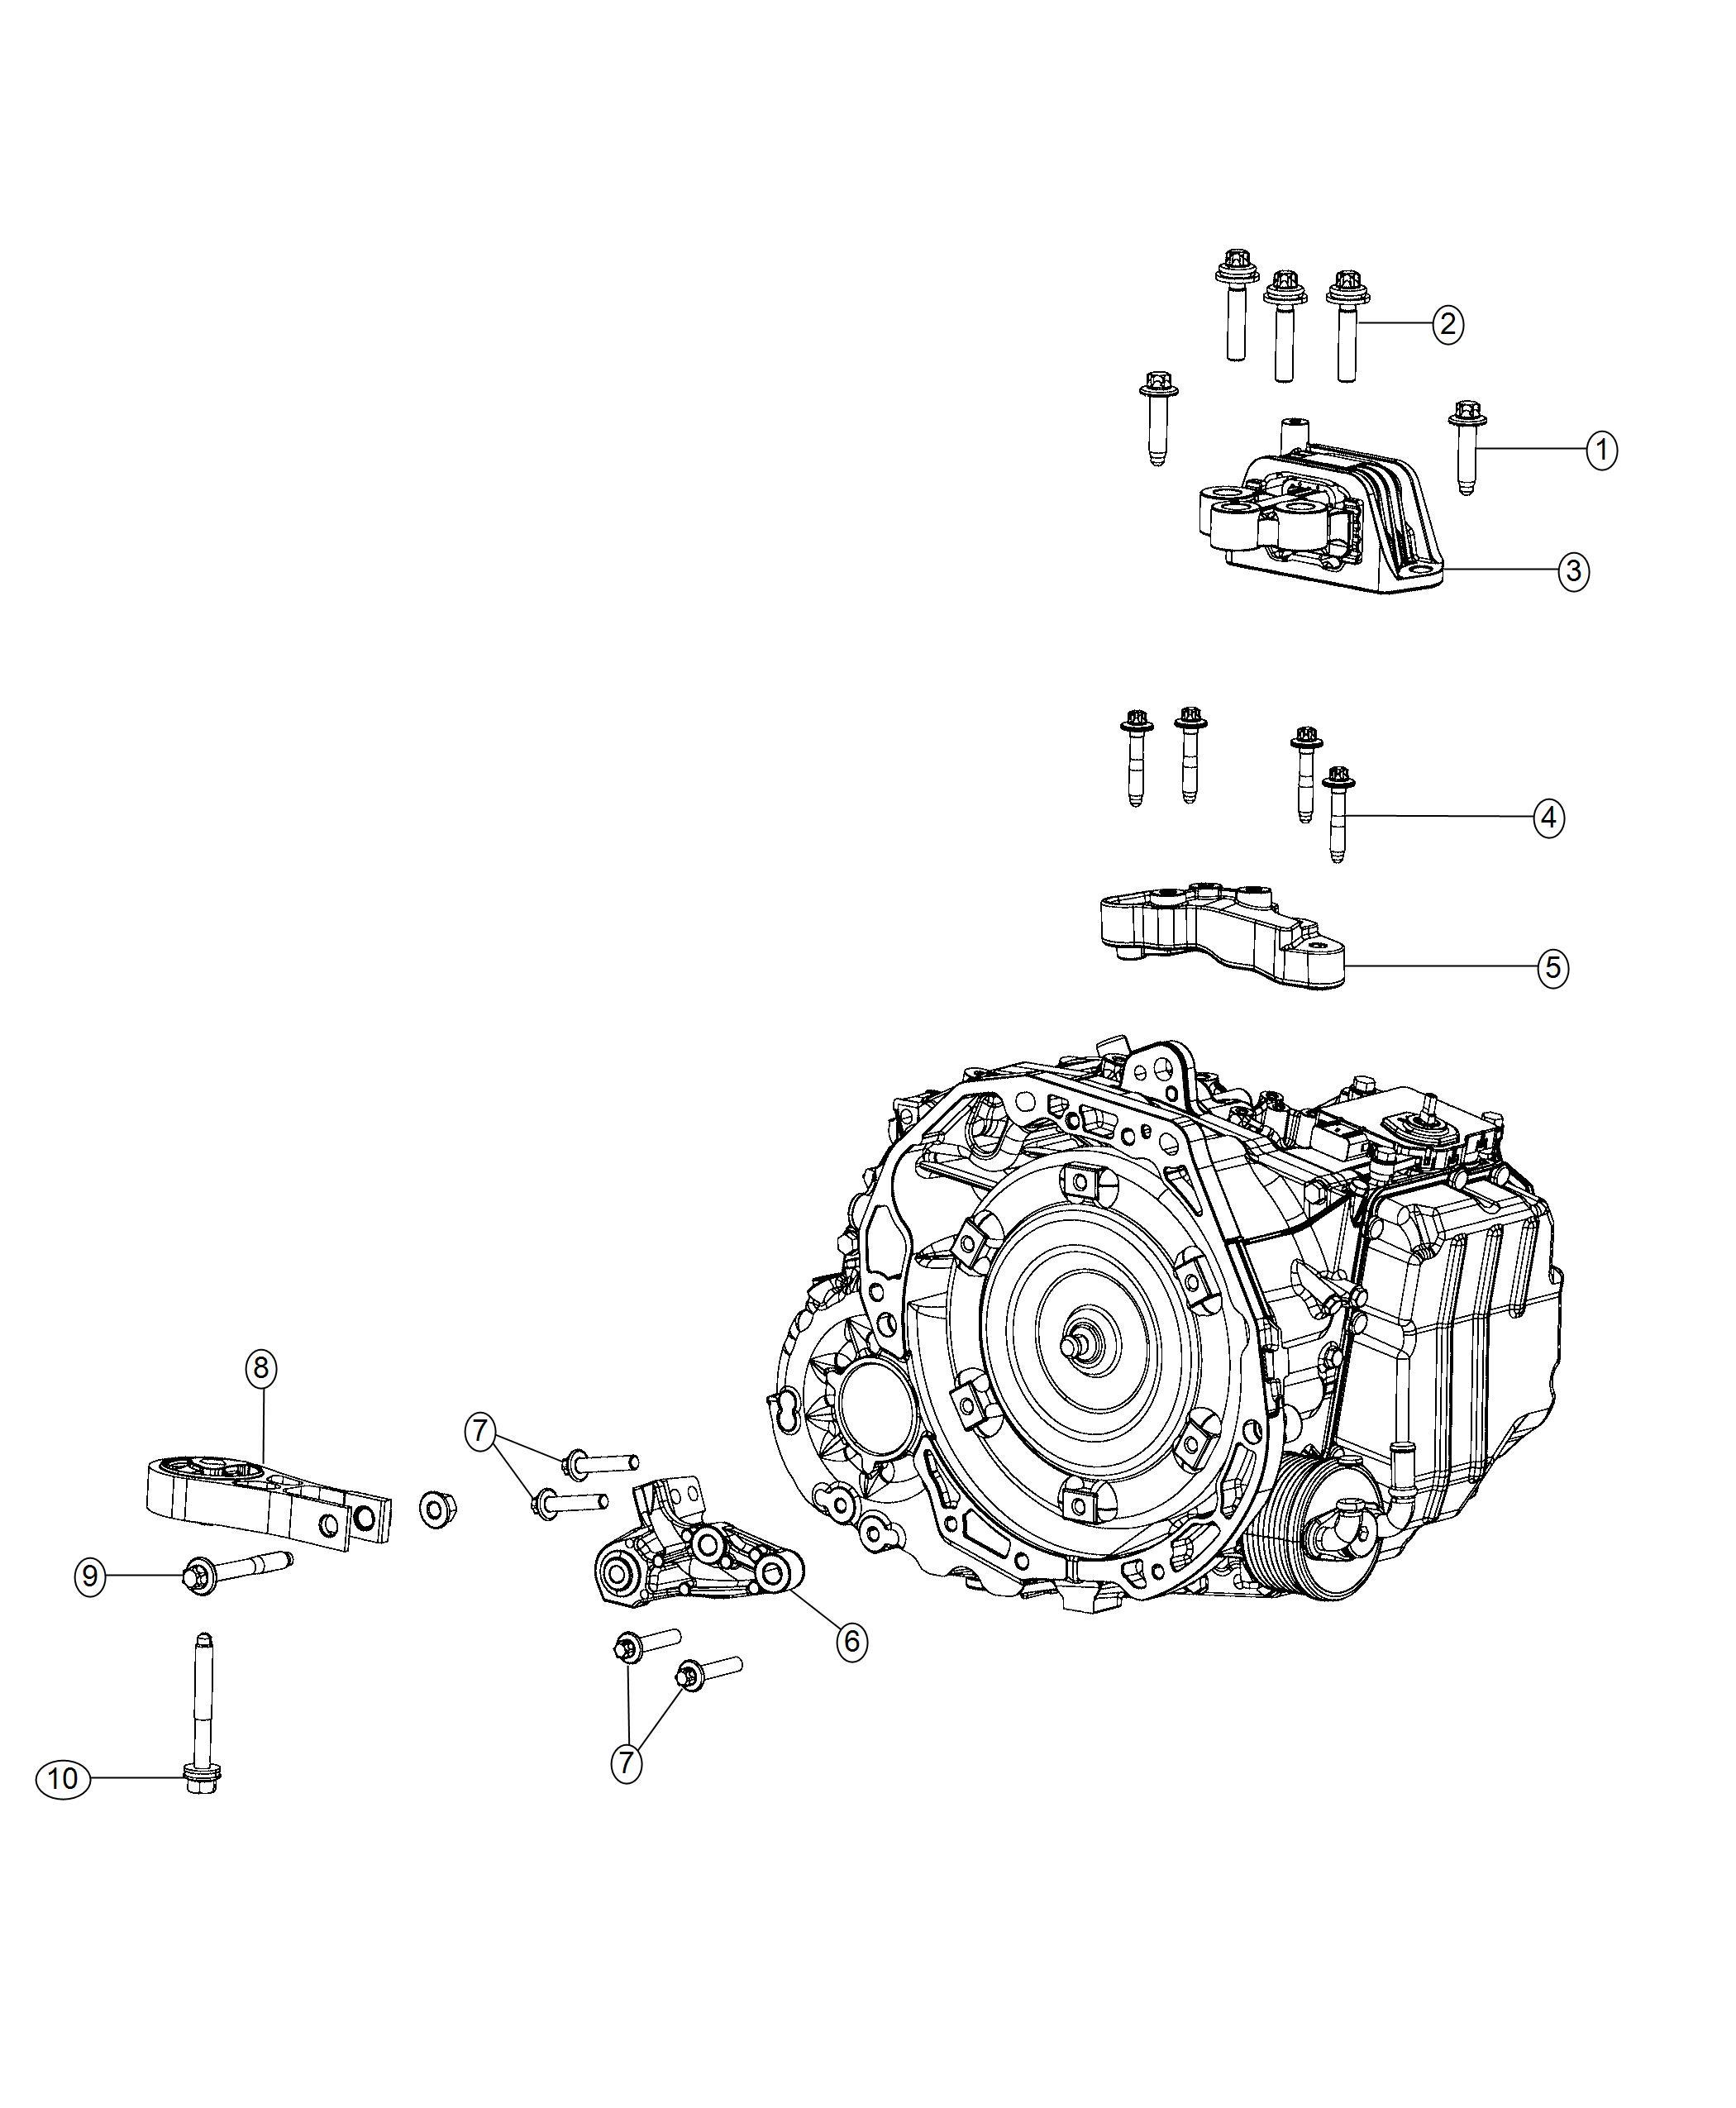 Jeep Compass Isolator. Transmission mount. [6-spd aisin